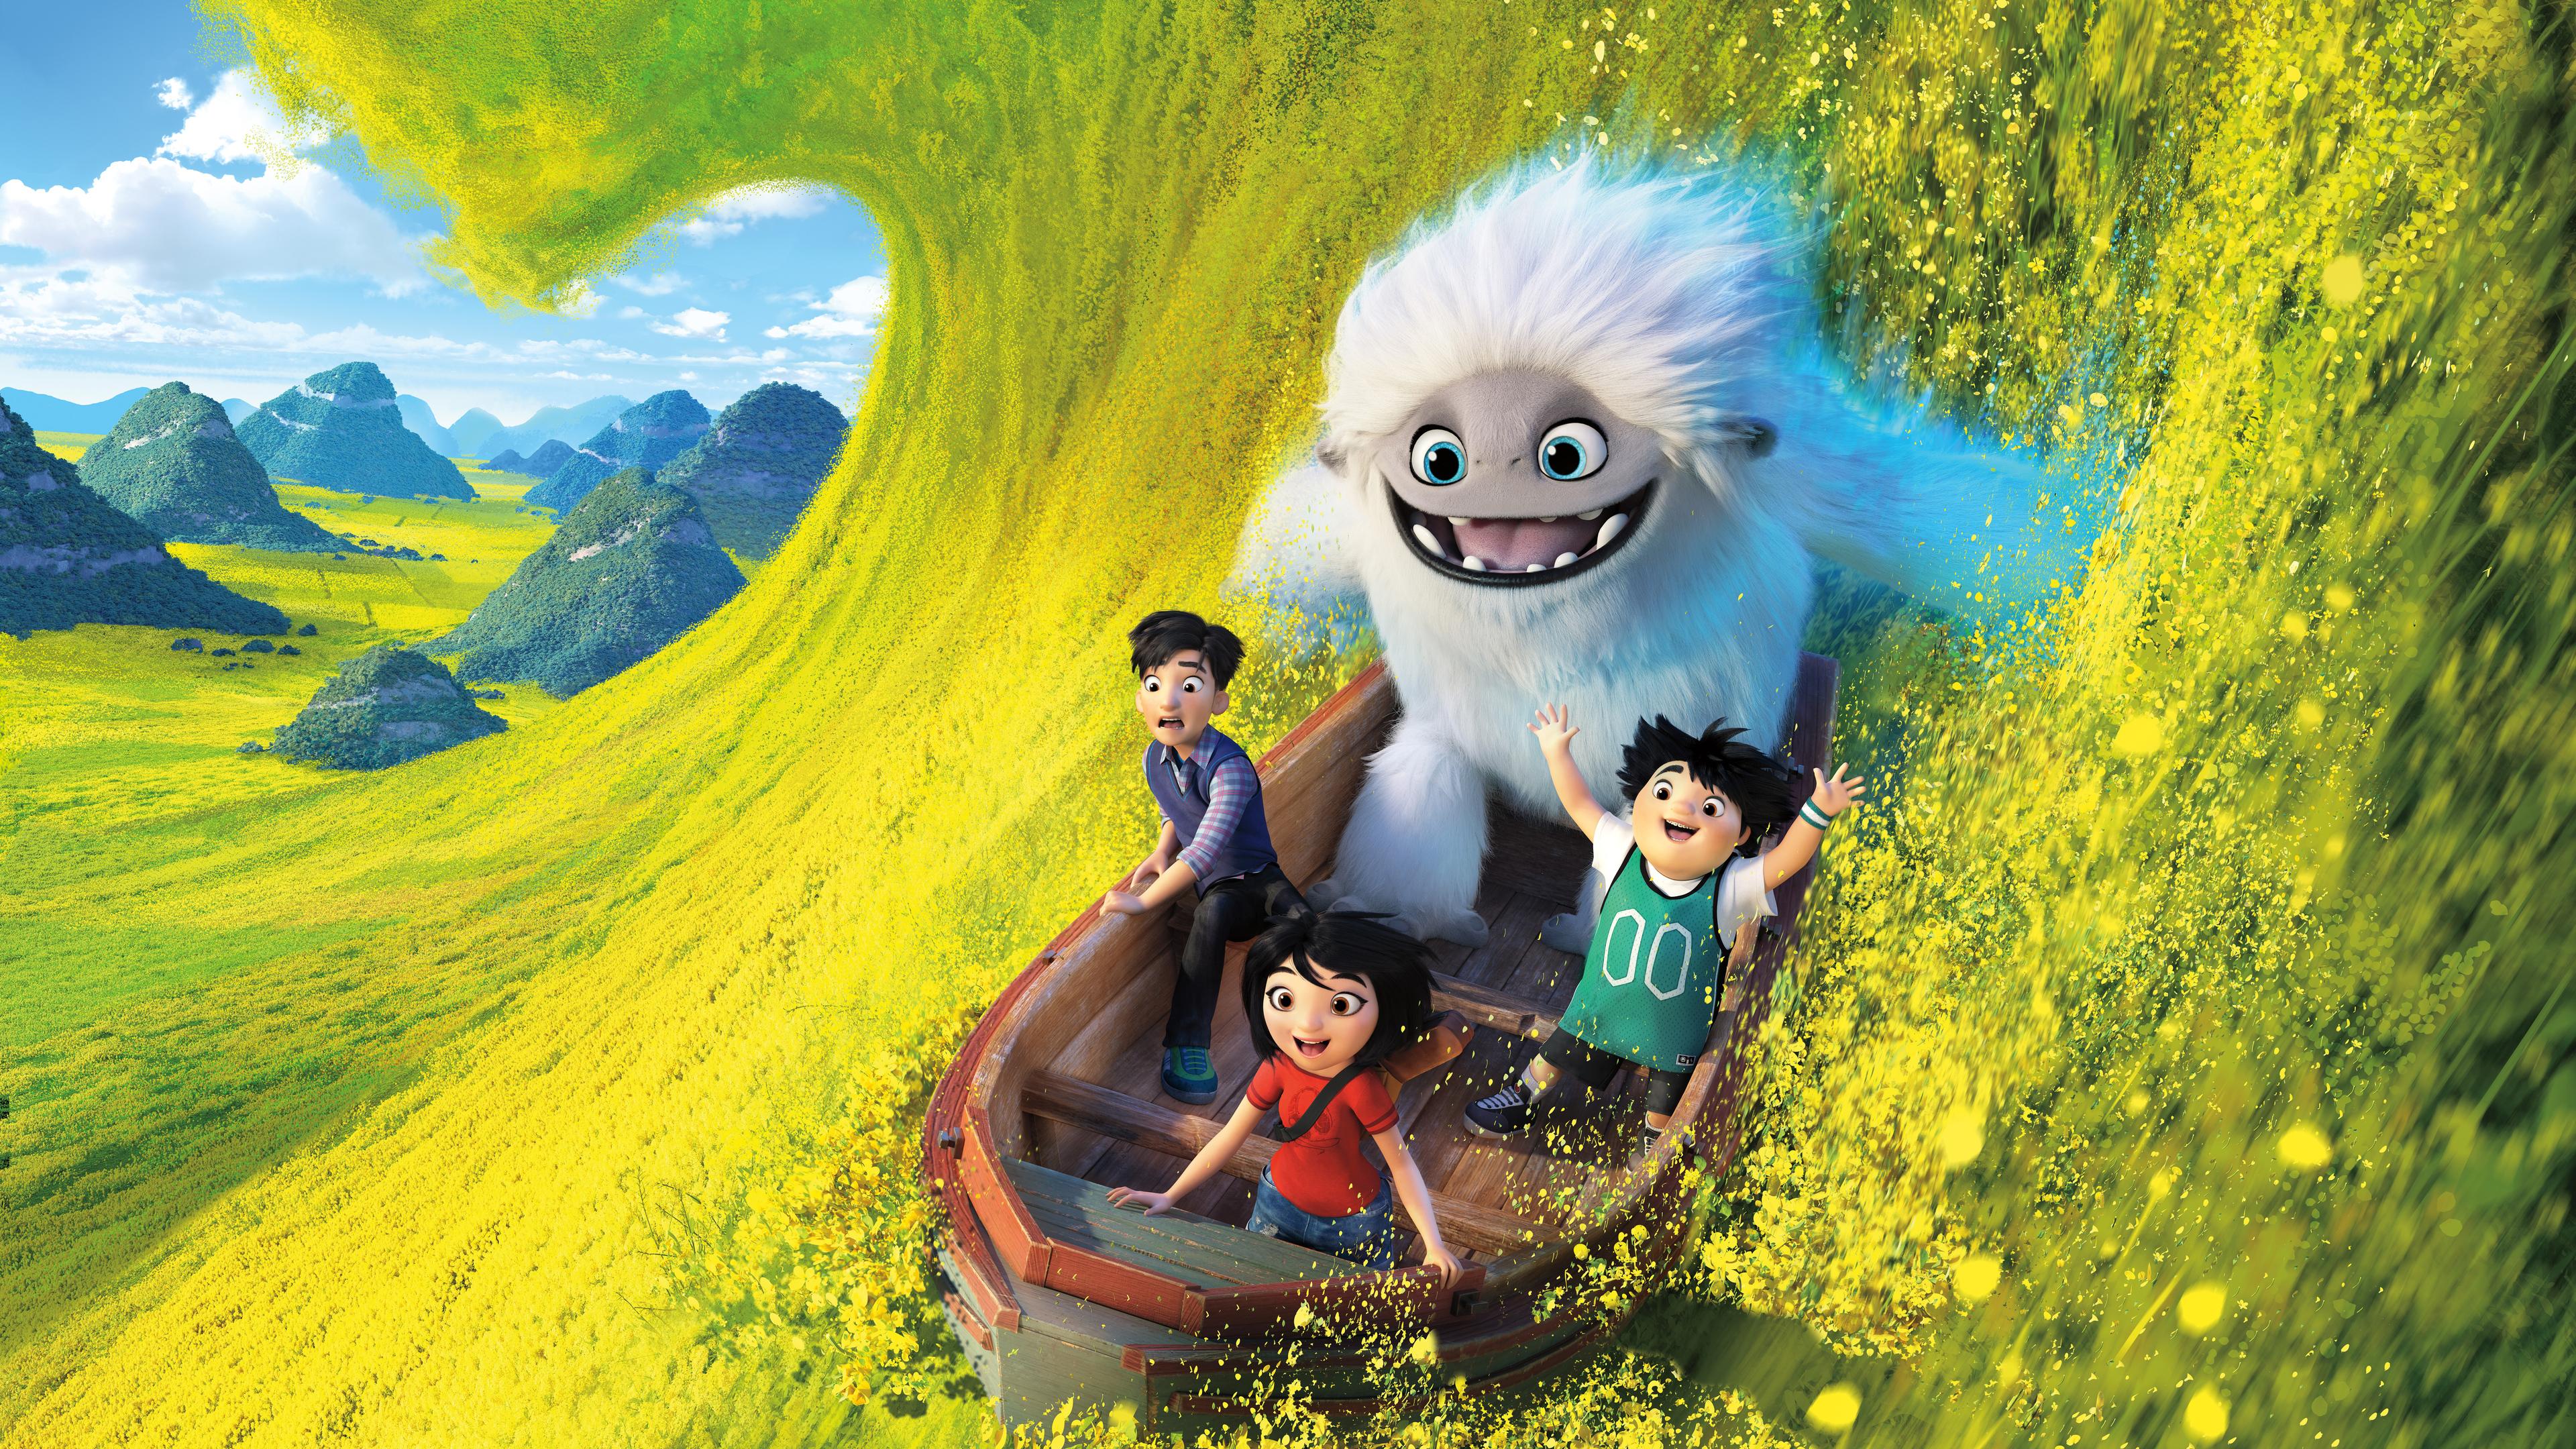 abominable 2019 animated movie 1569187393 - Abominable 2019 Animated Movie - hd-wallpapers, animated movies wallpapers, abominable wallpapers, 8k wallpapers, 5k wallpapers, 4k-wallpapers, 2019 movies wallpapers